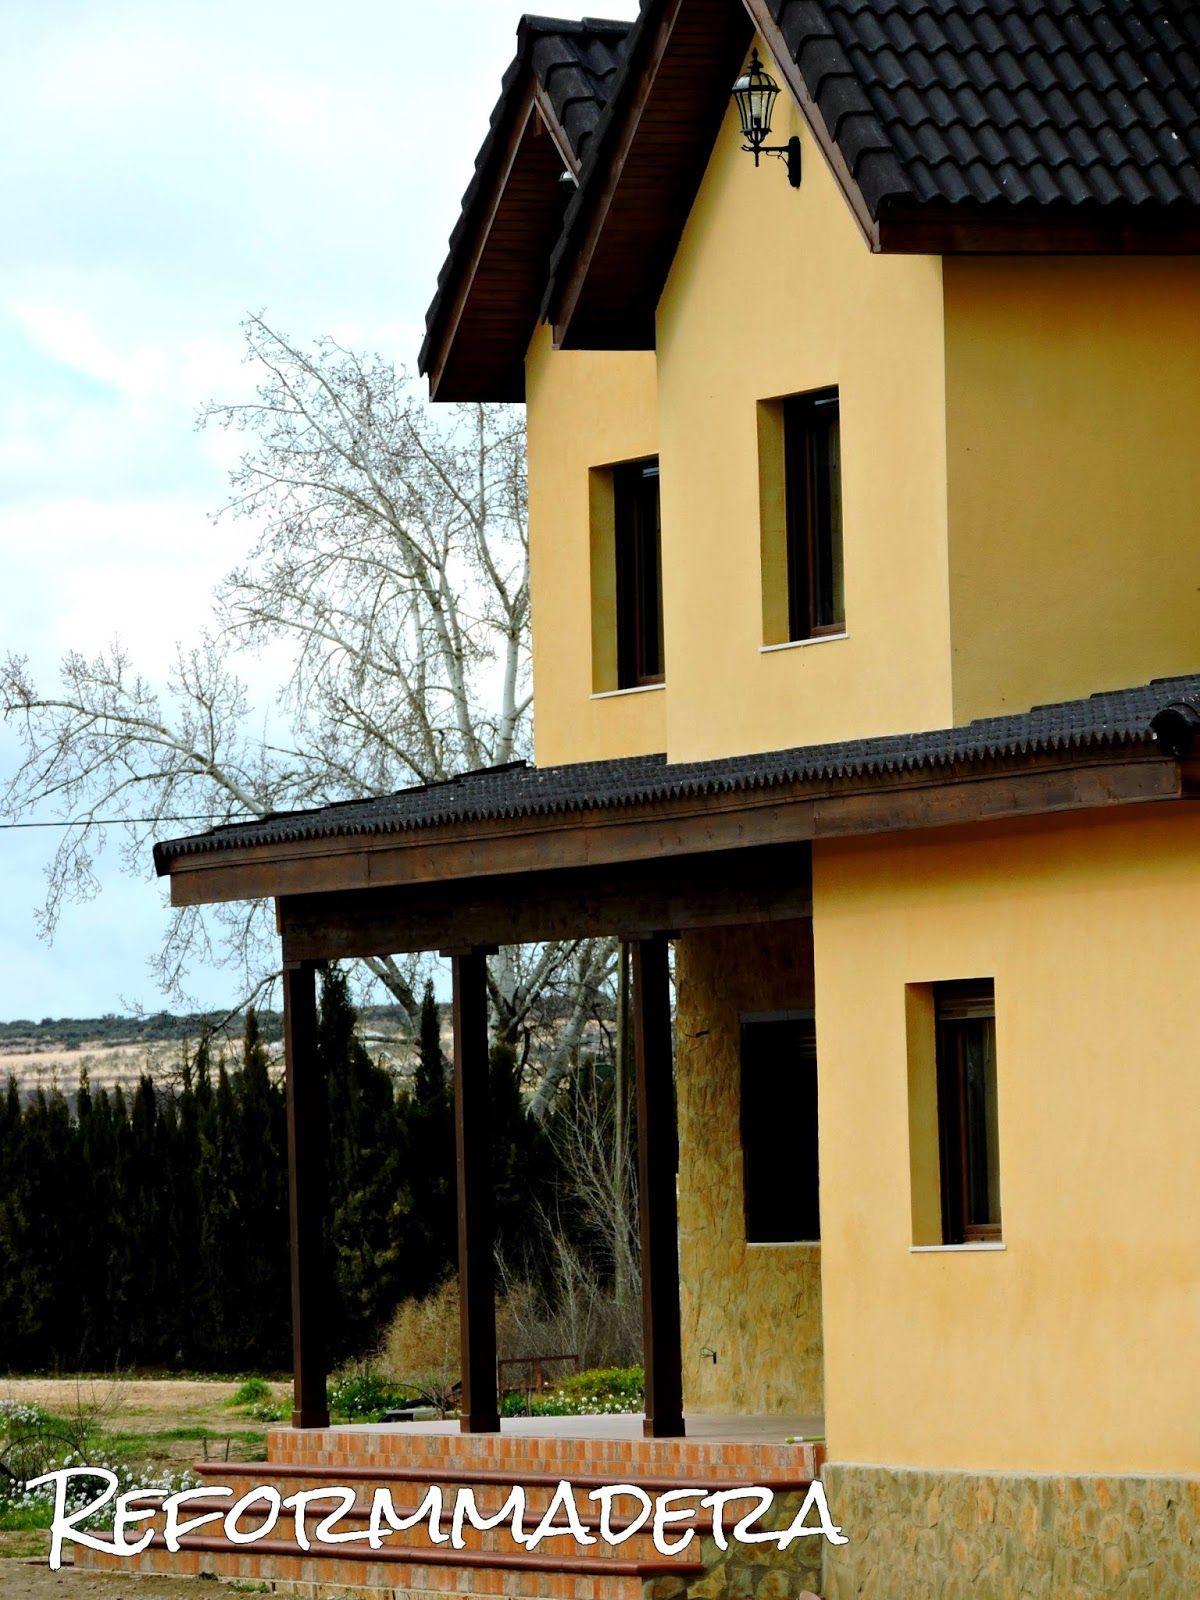 Casas de Madera Reformmadera: casas de madera